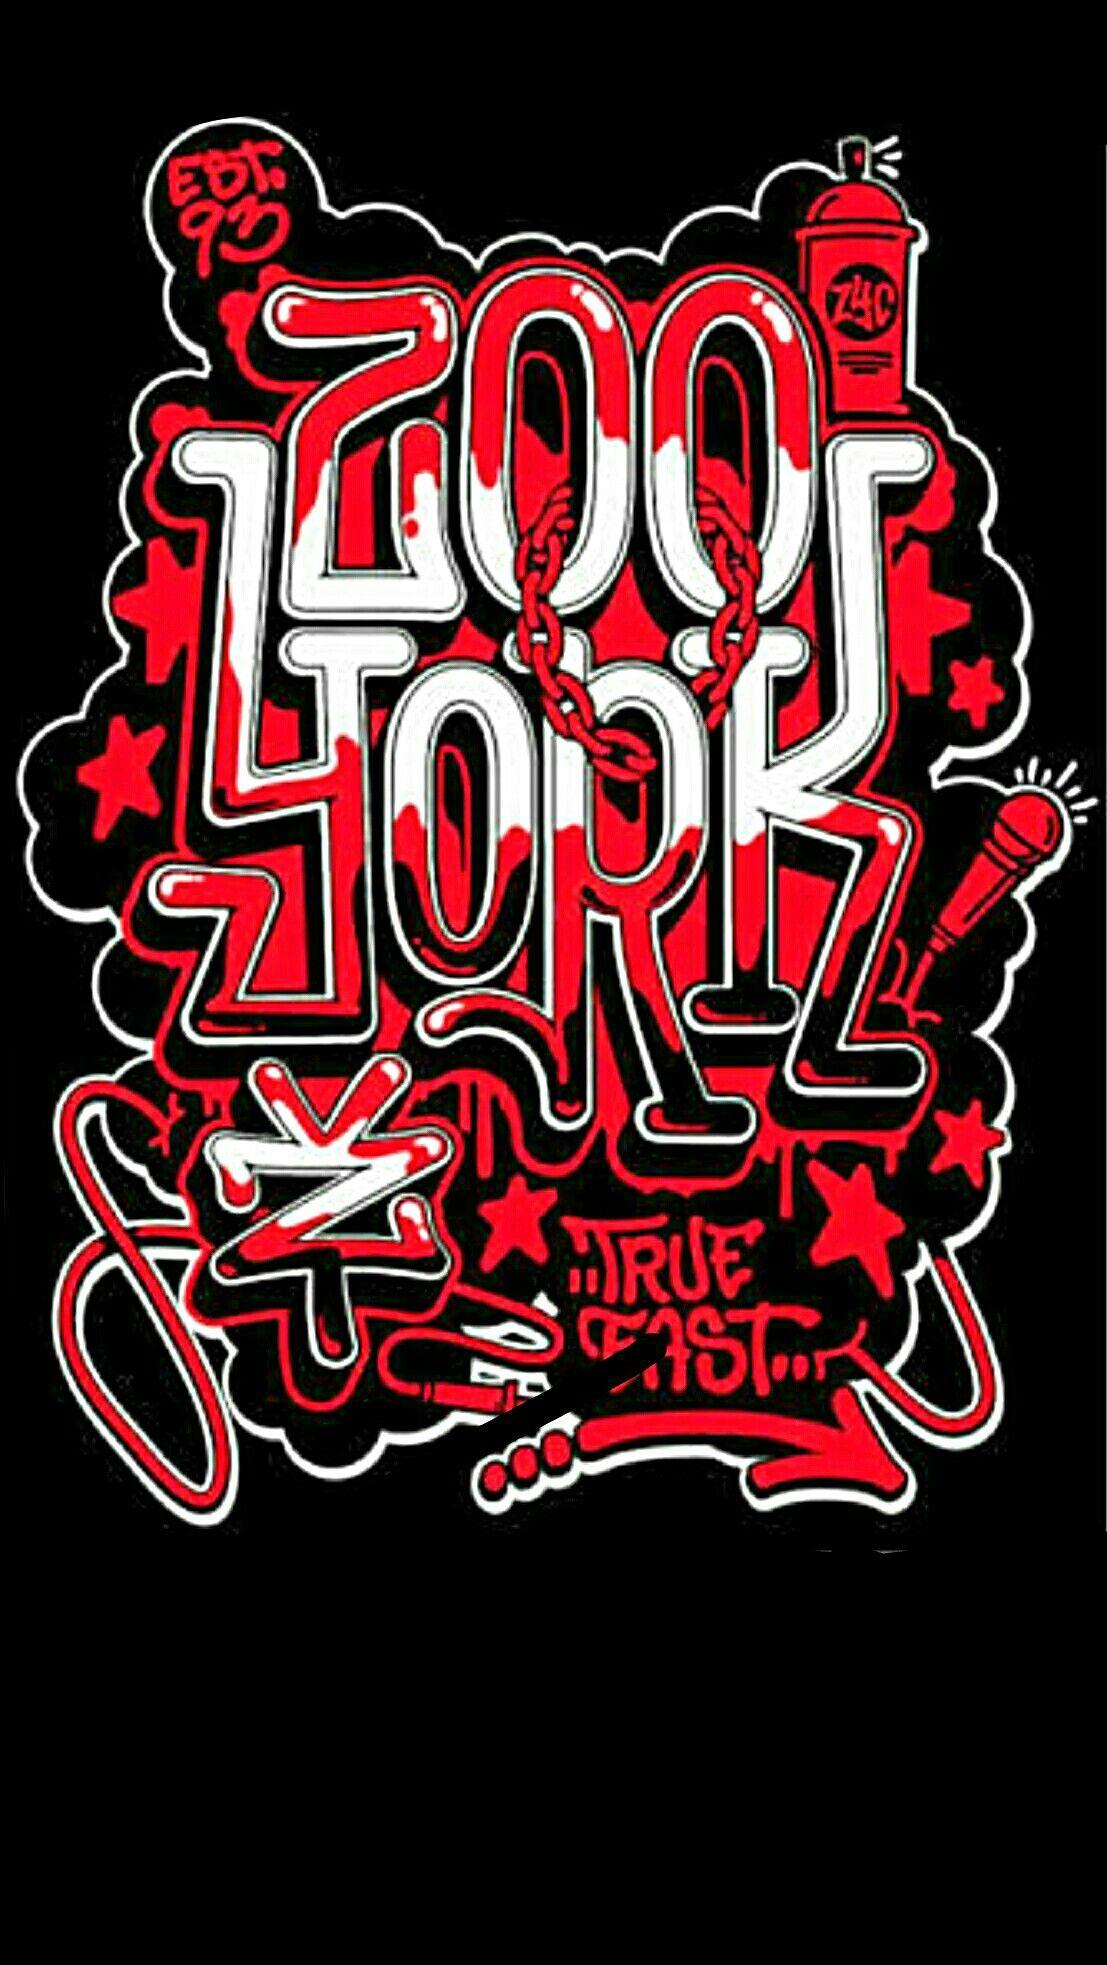 zoo york hd wallpaper android iphone Disenos de